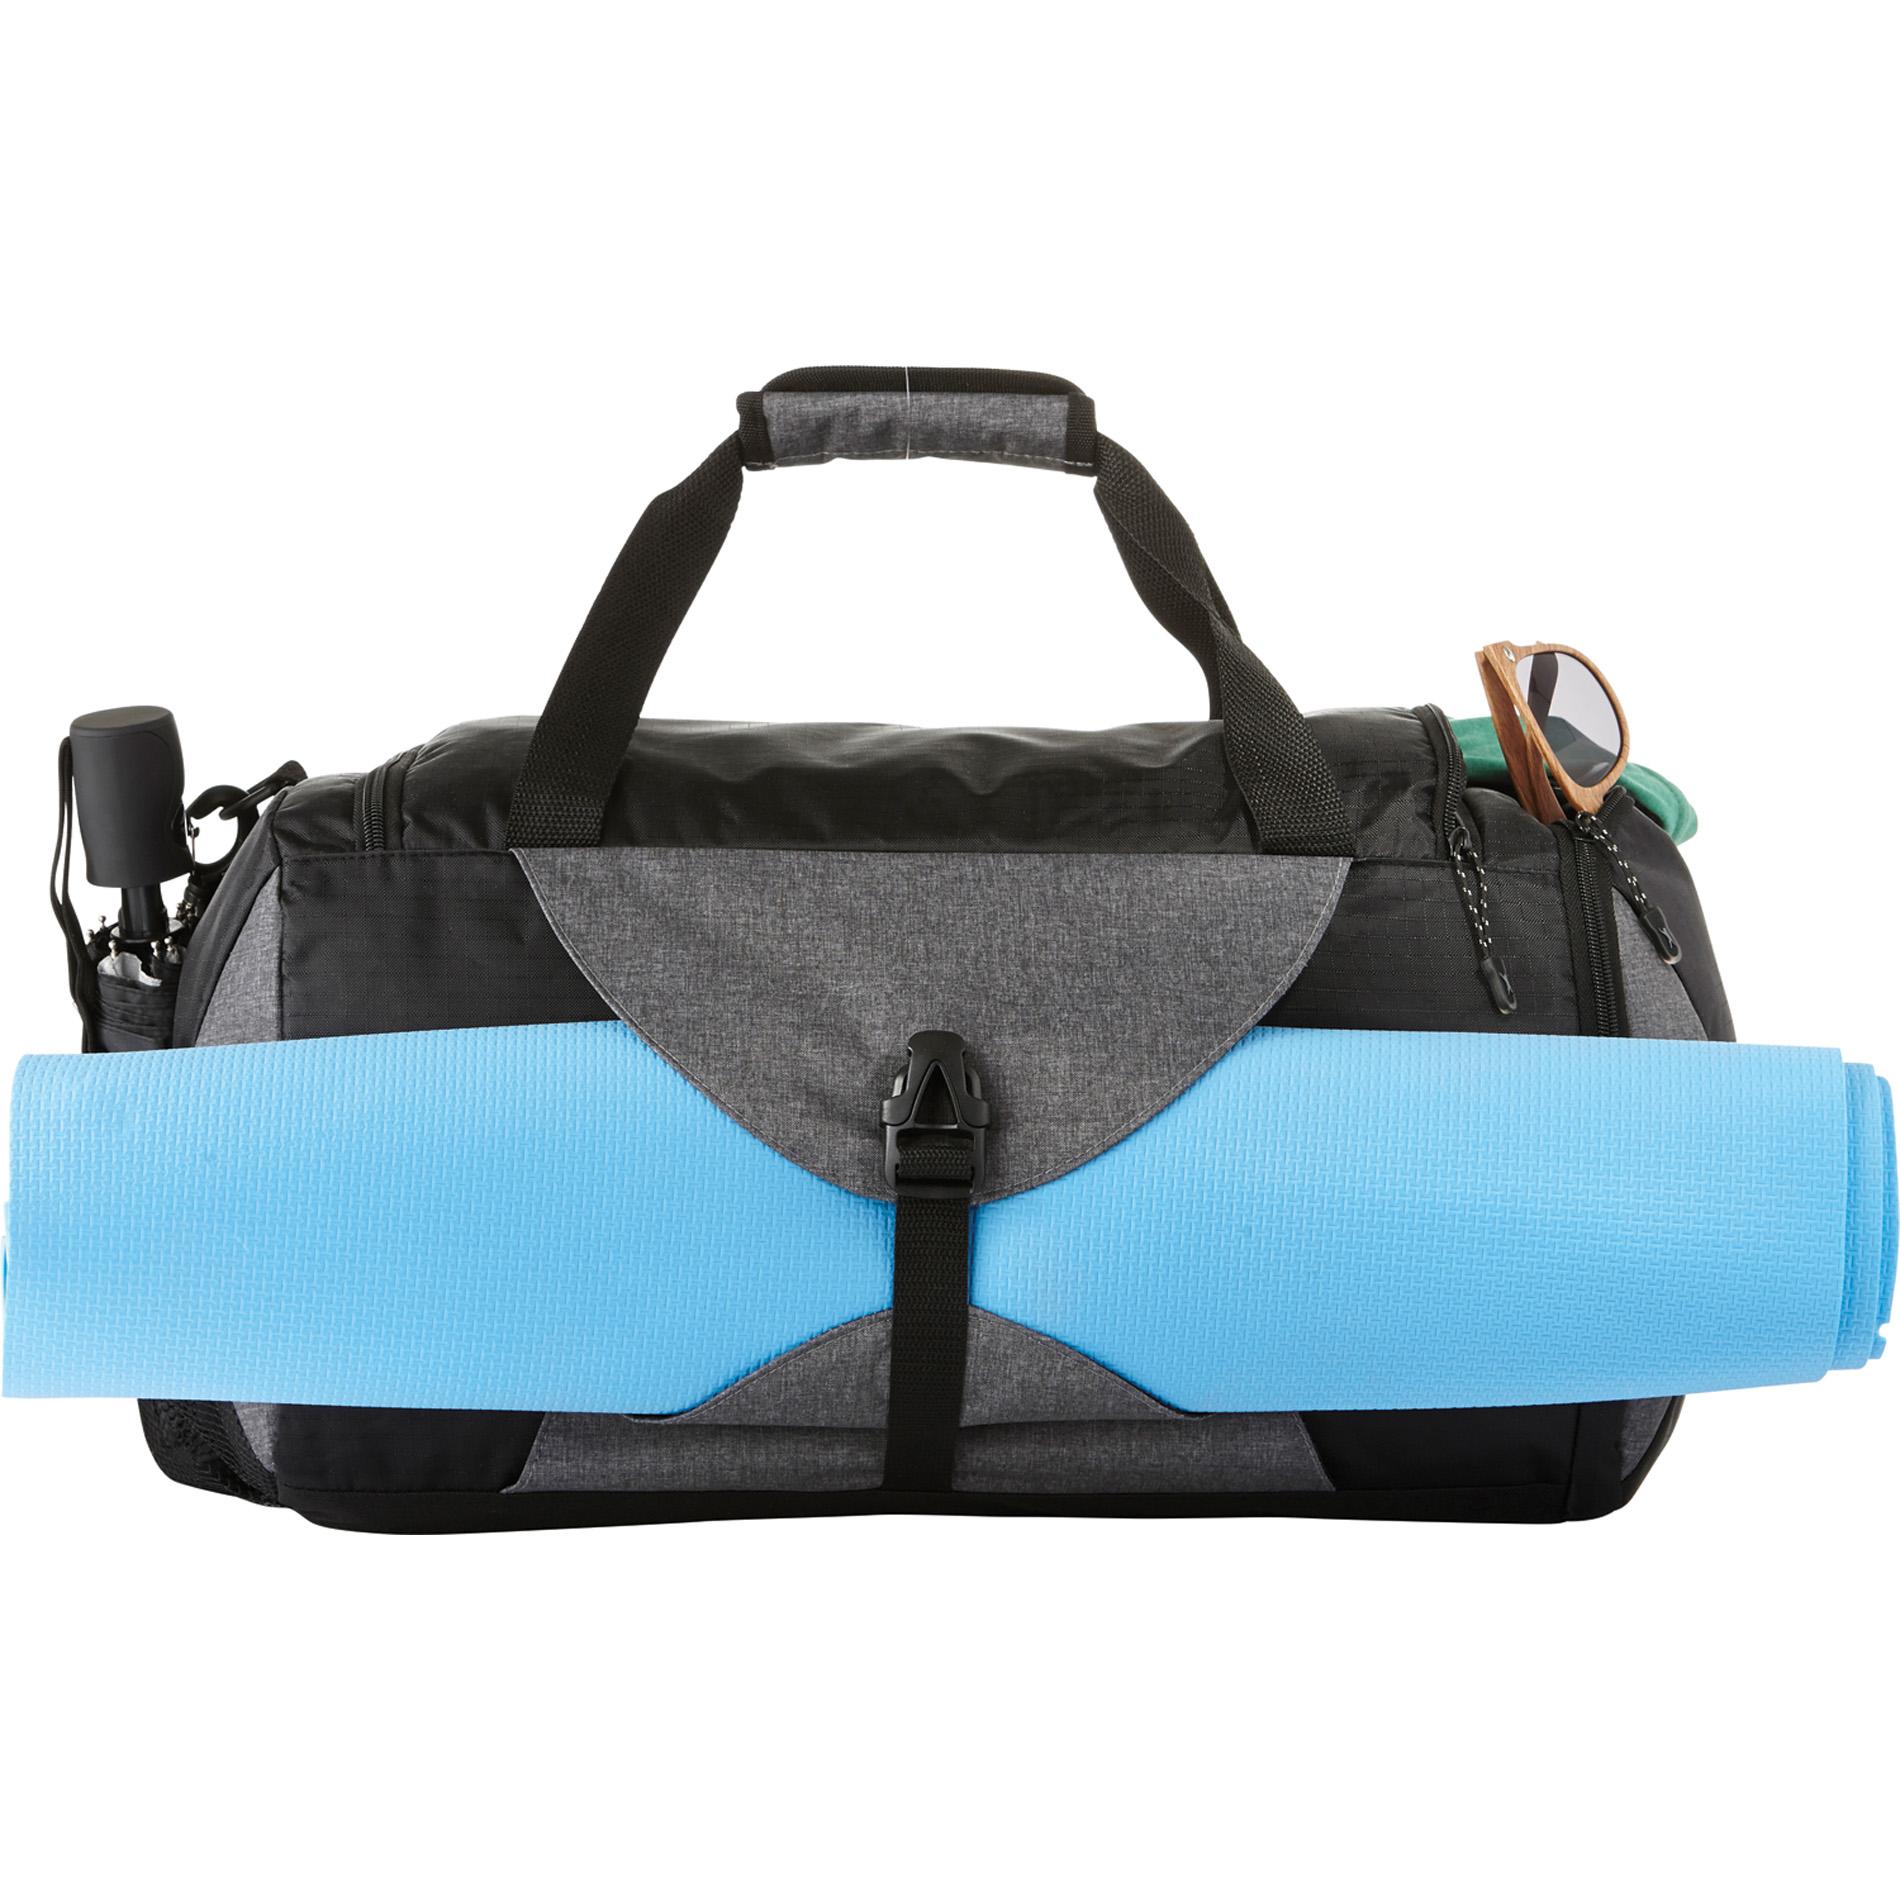 Slazenger 6050 85 20 Gym Yoga Duffel Bag